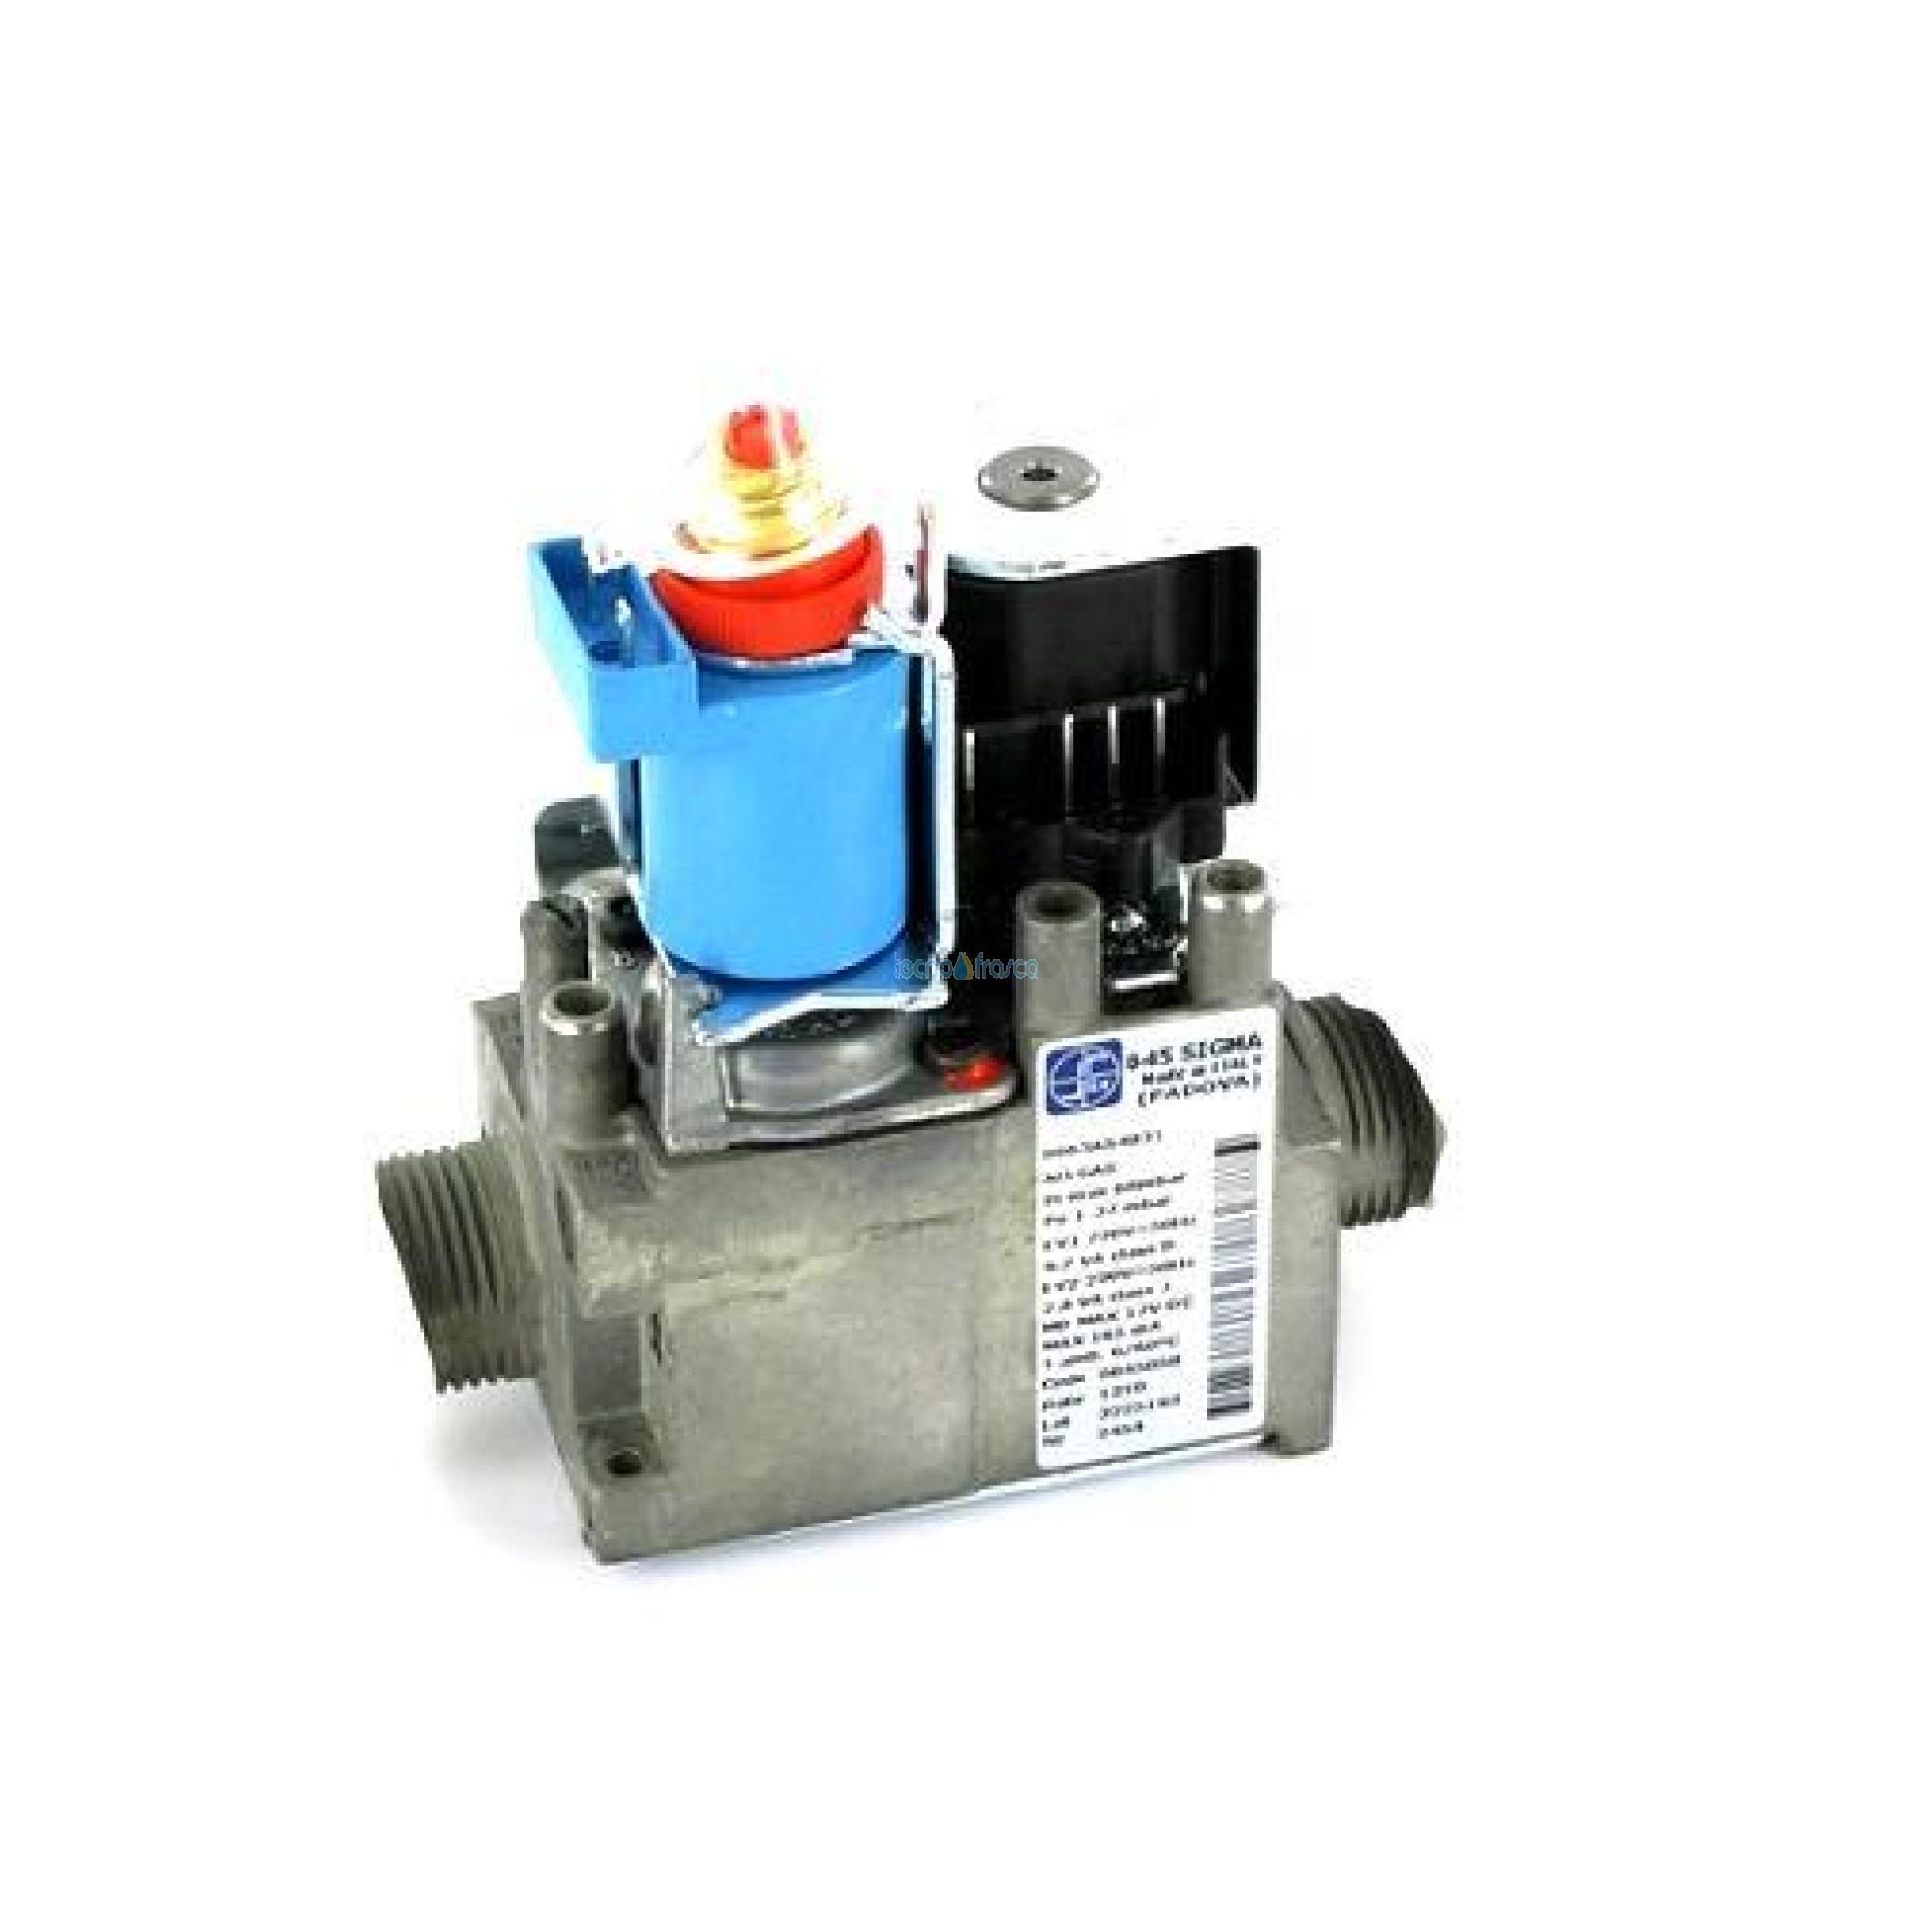 Ariston valvola gas 845 sigma 997089